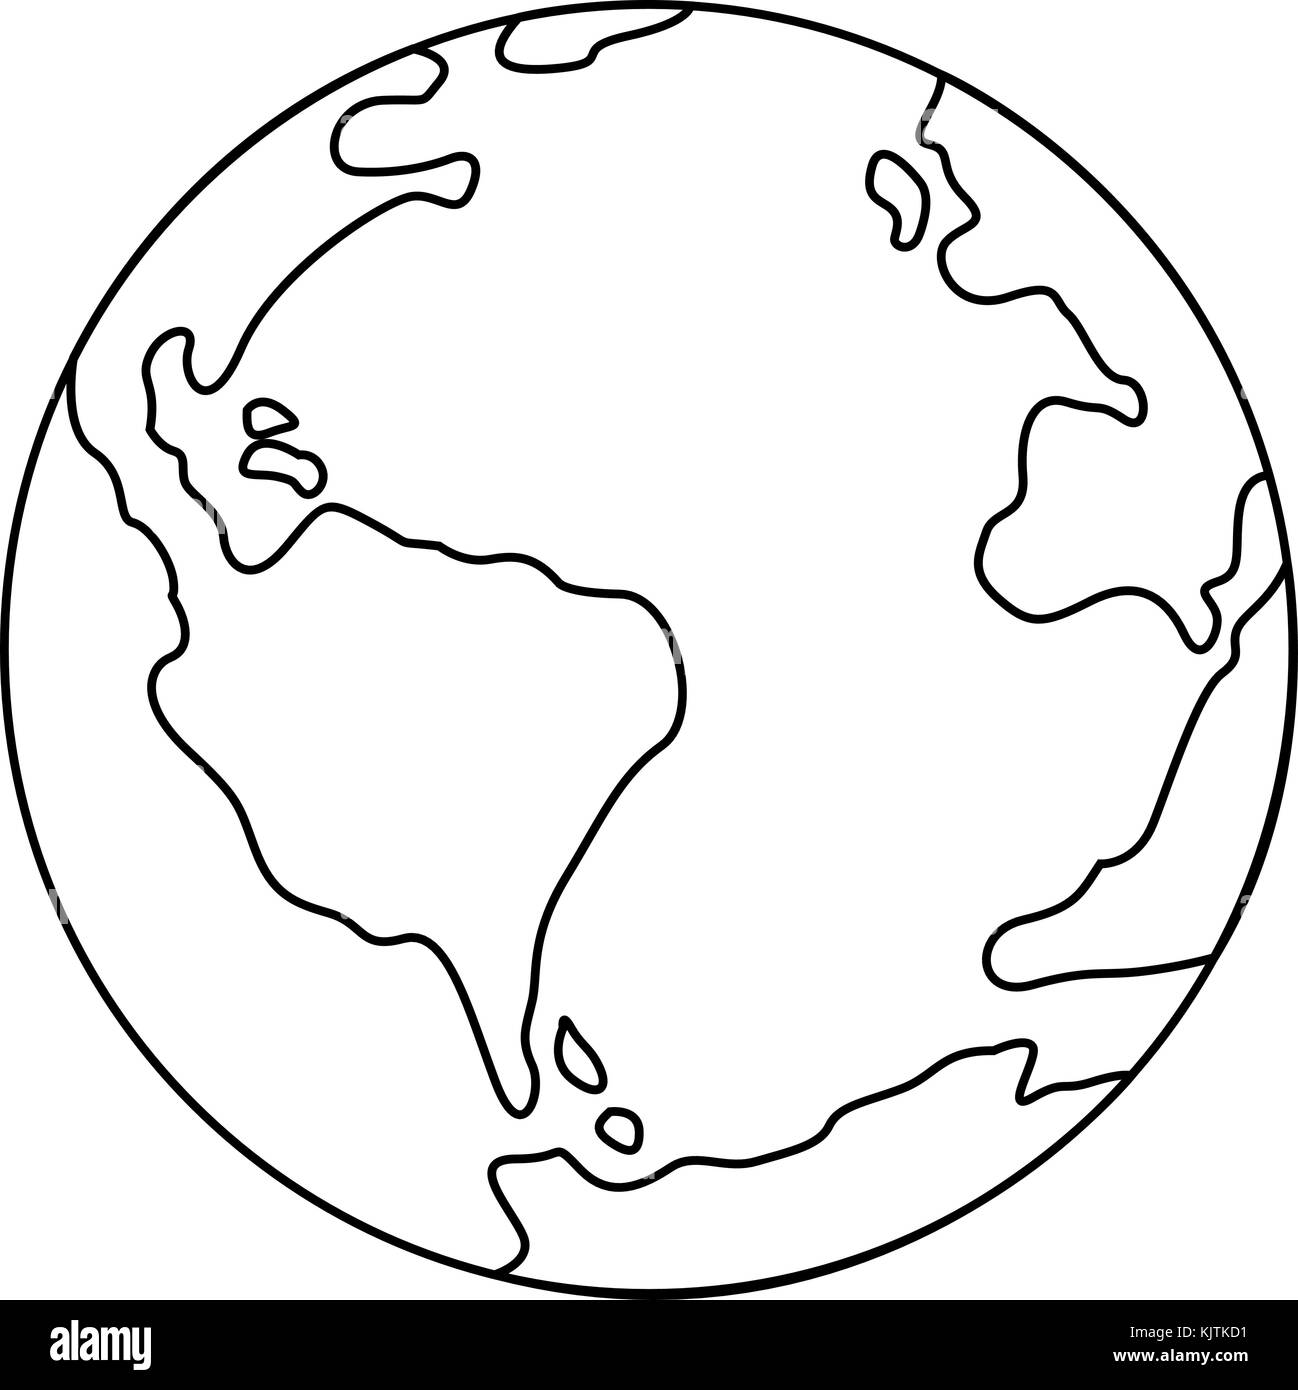 Symbol of earth thin line icon - Stock Image